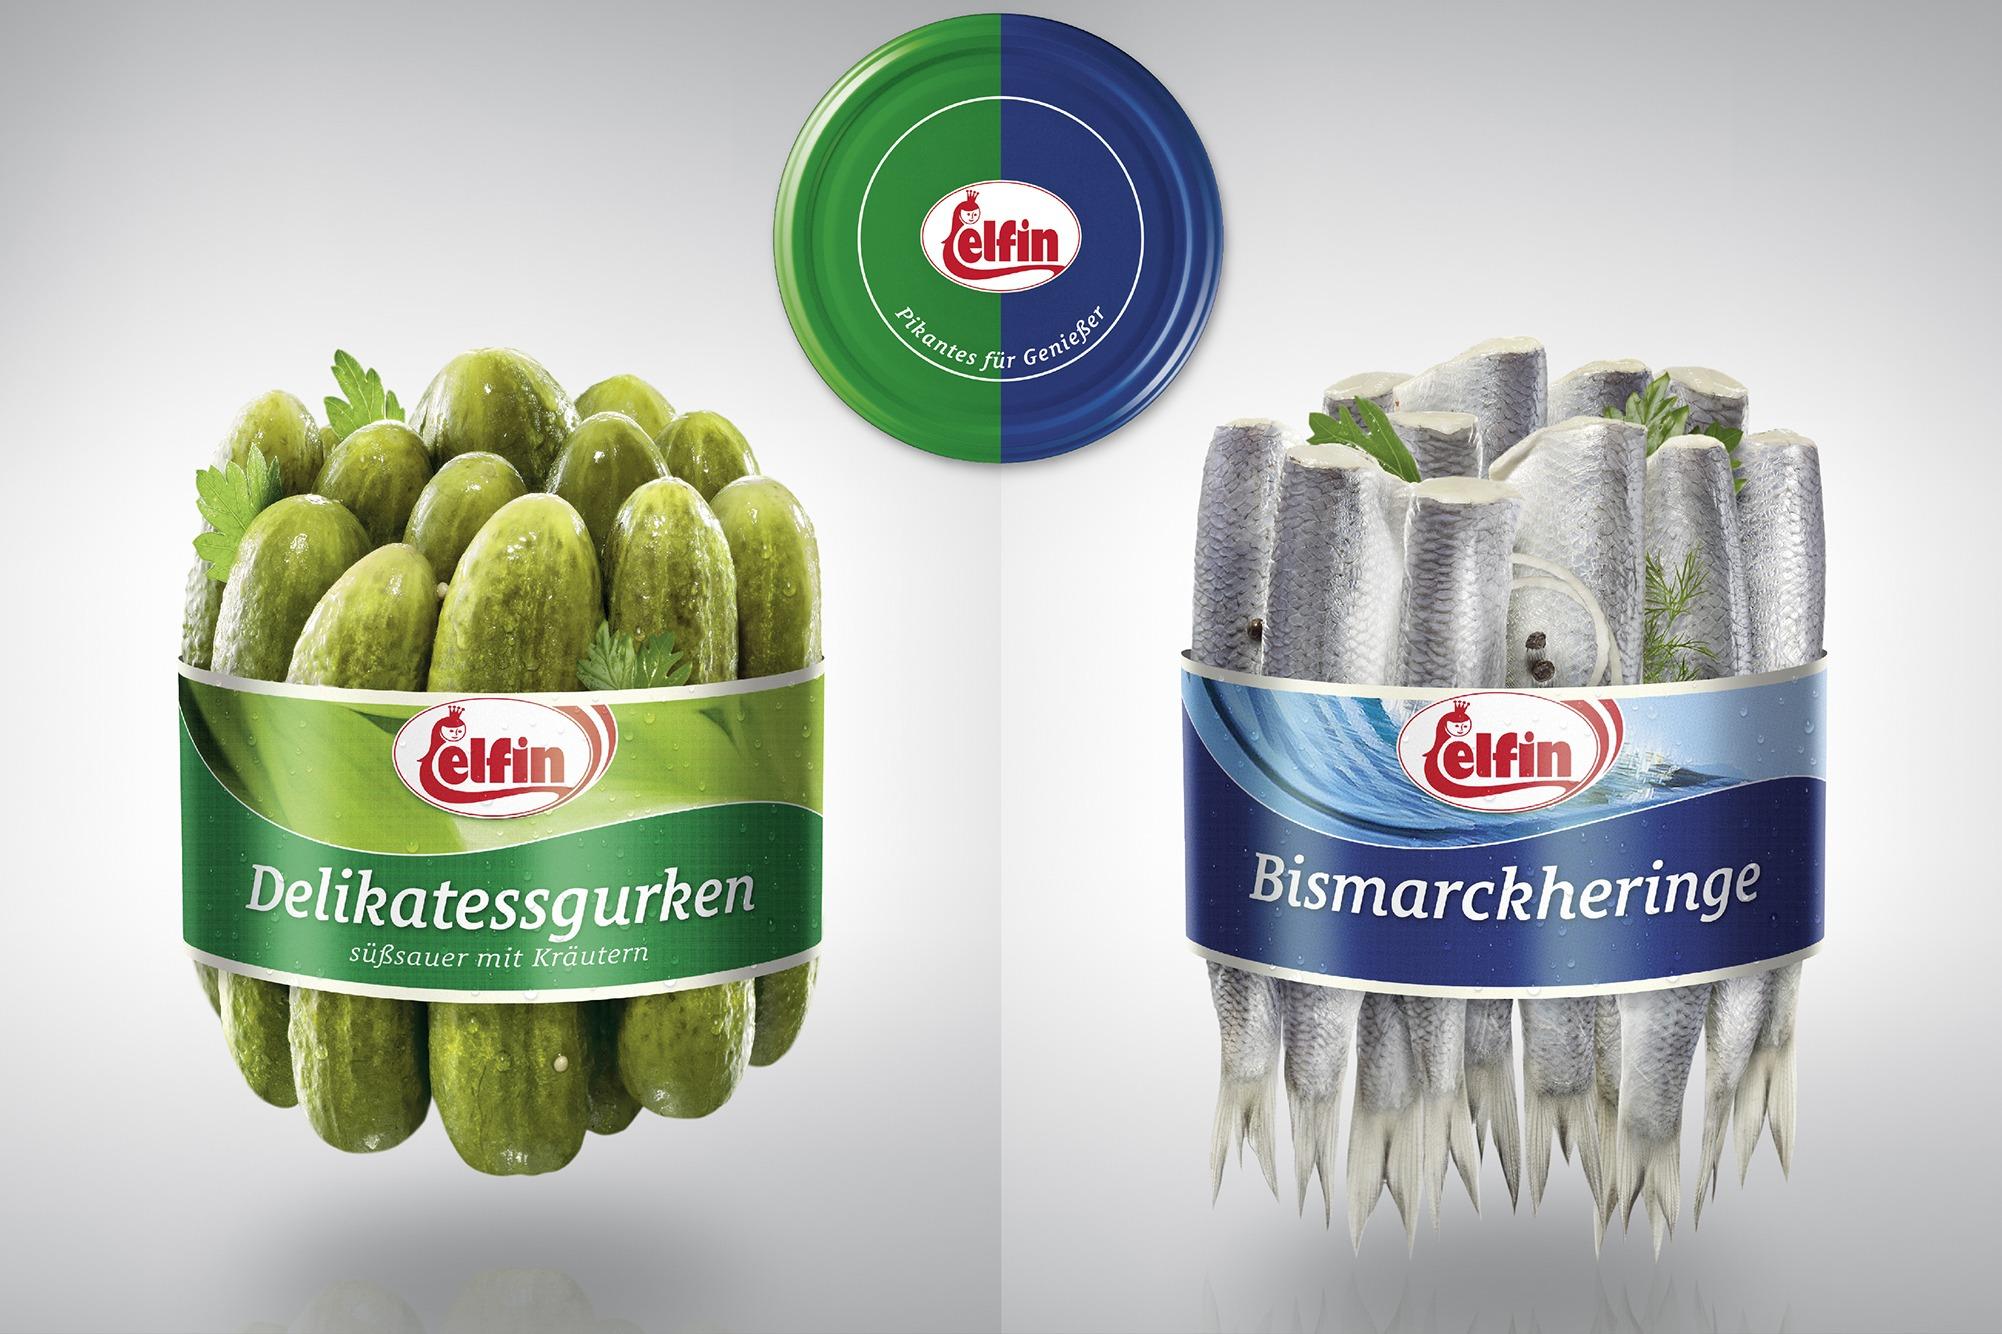 Imagebild ELFIN Produktkategorien